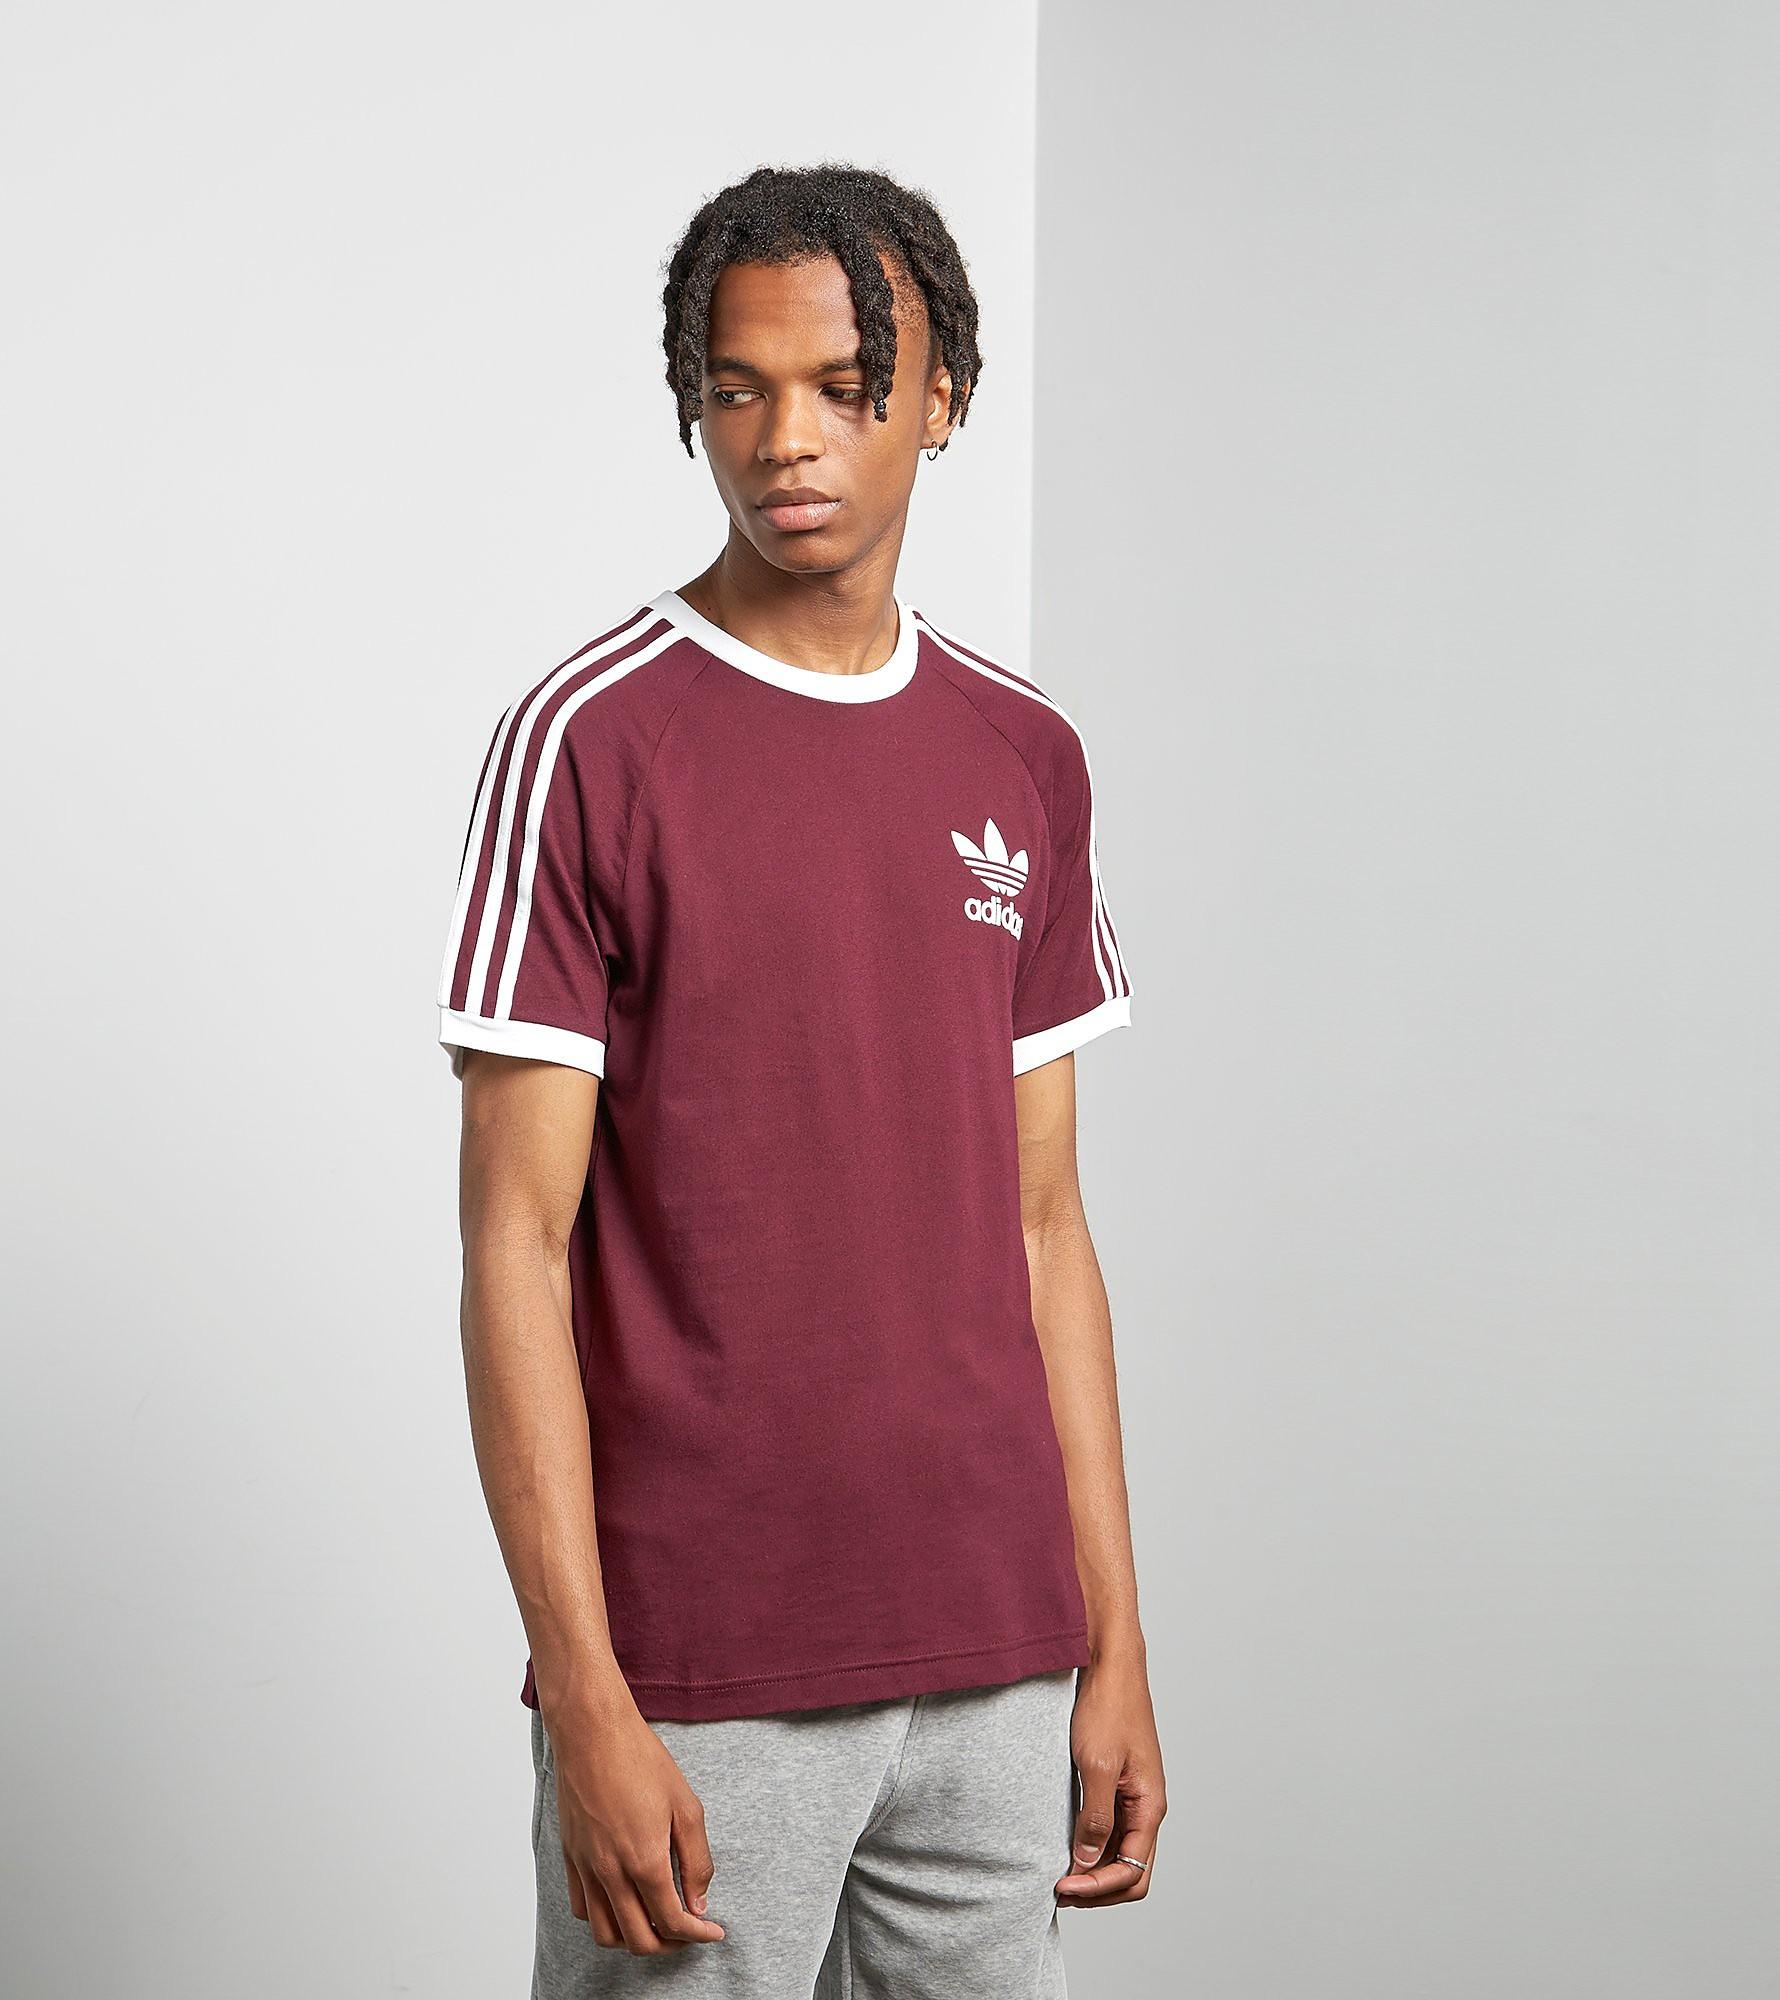 adidas Originals California-T-Shirt, Maroon